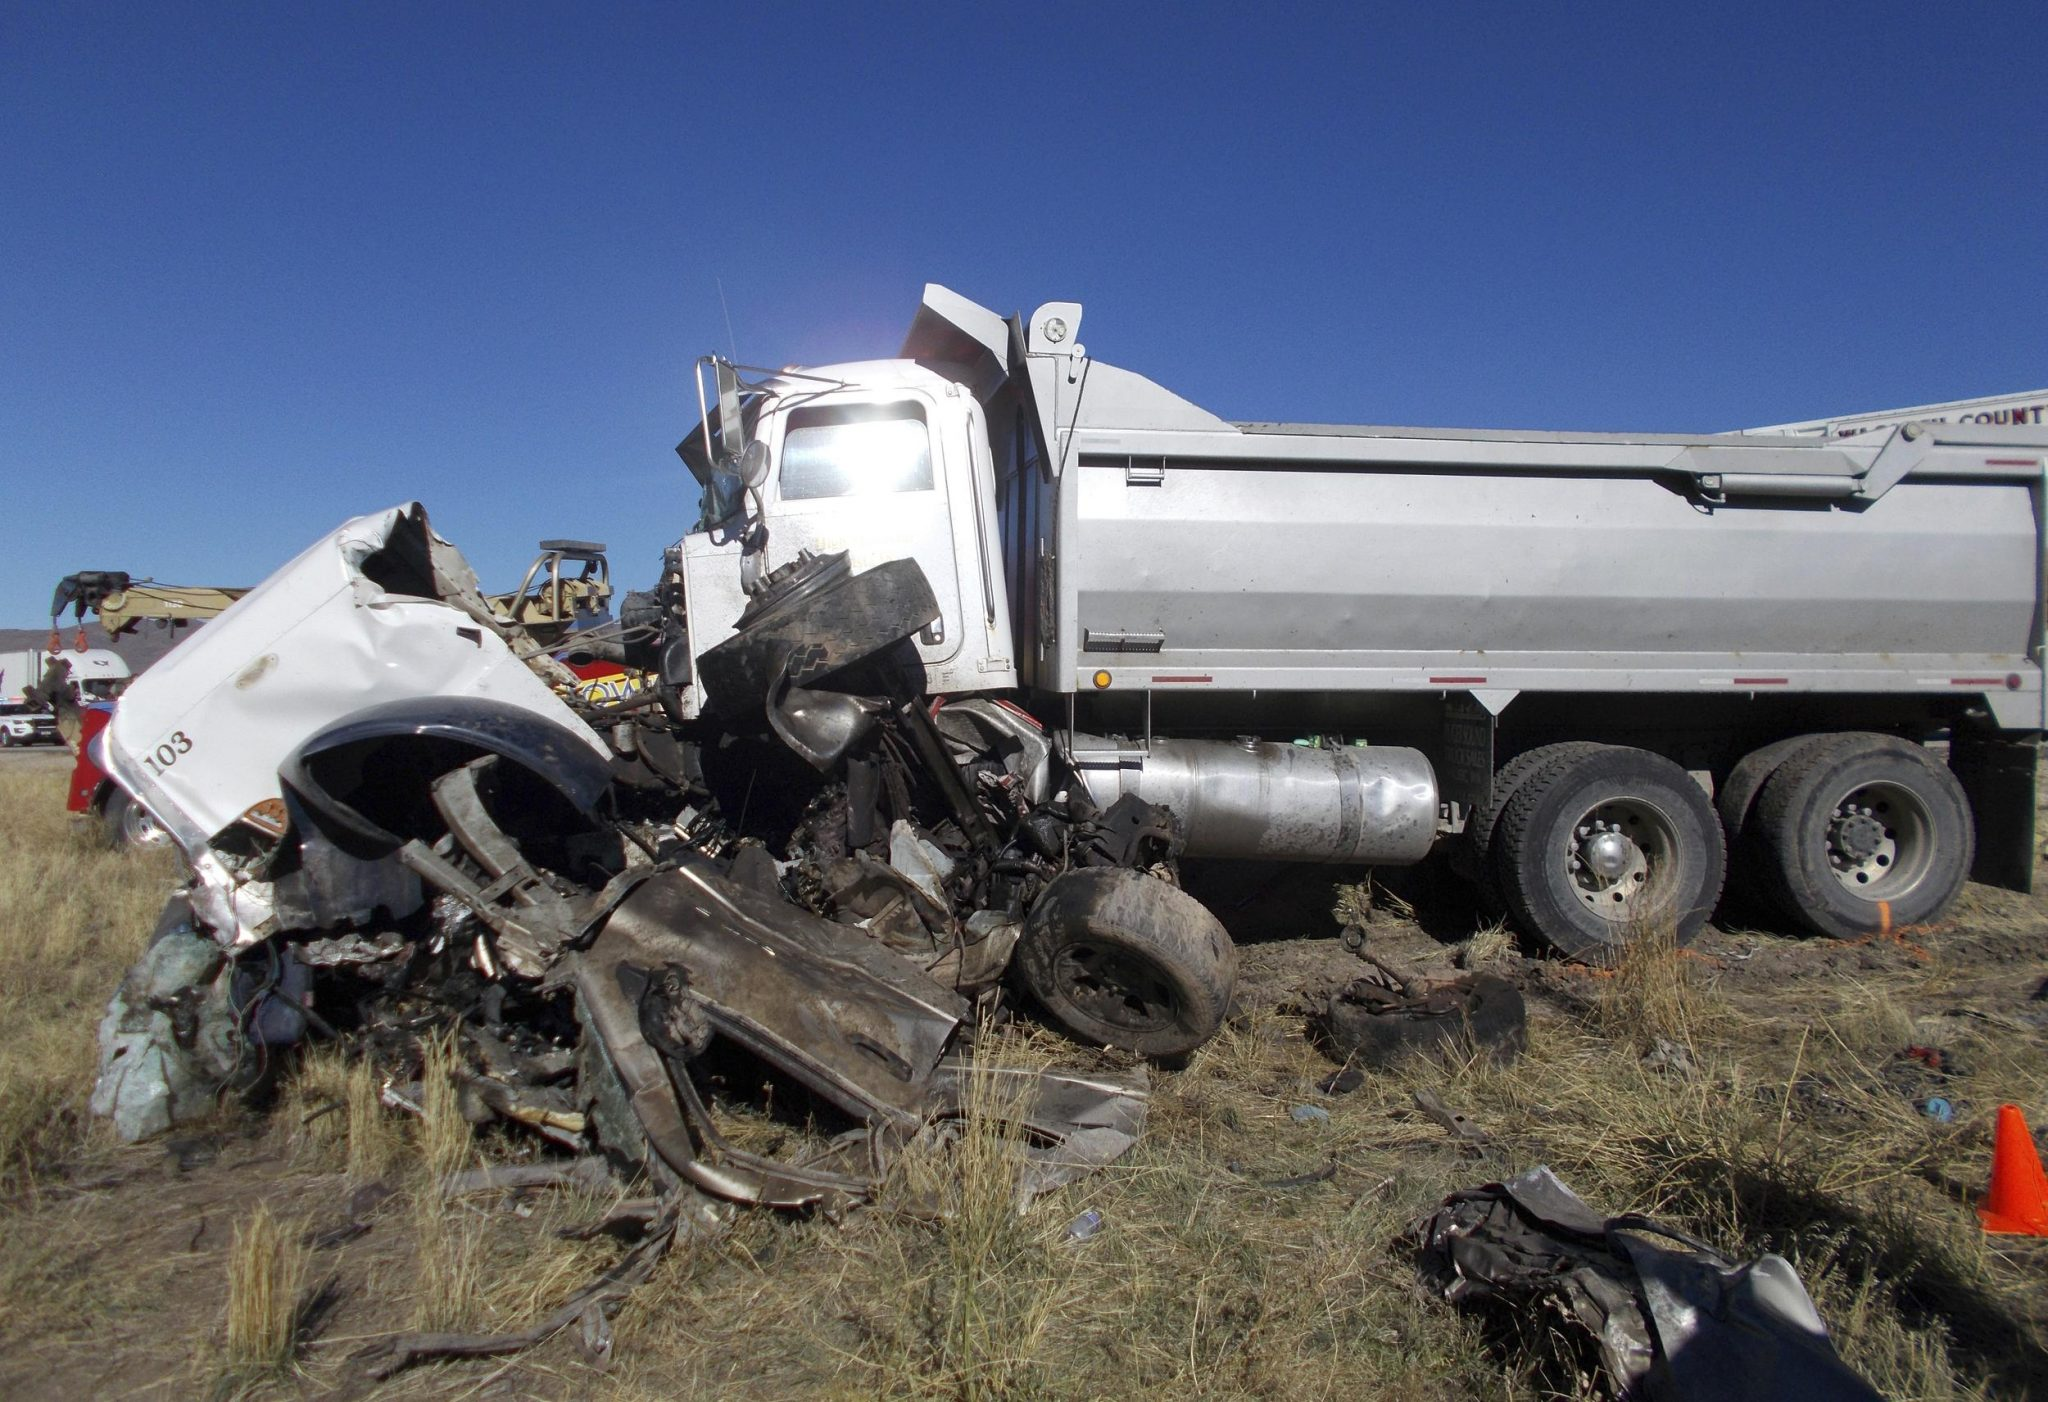 Utah Truck Driver Is Jailed Without Bond After Crash Kills 6